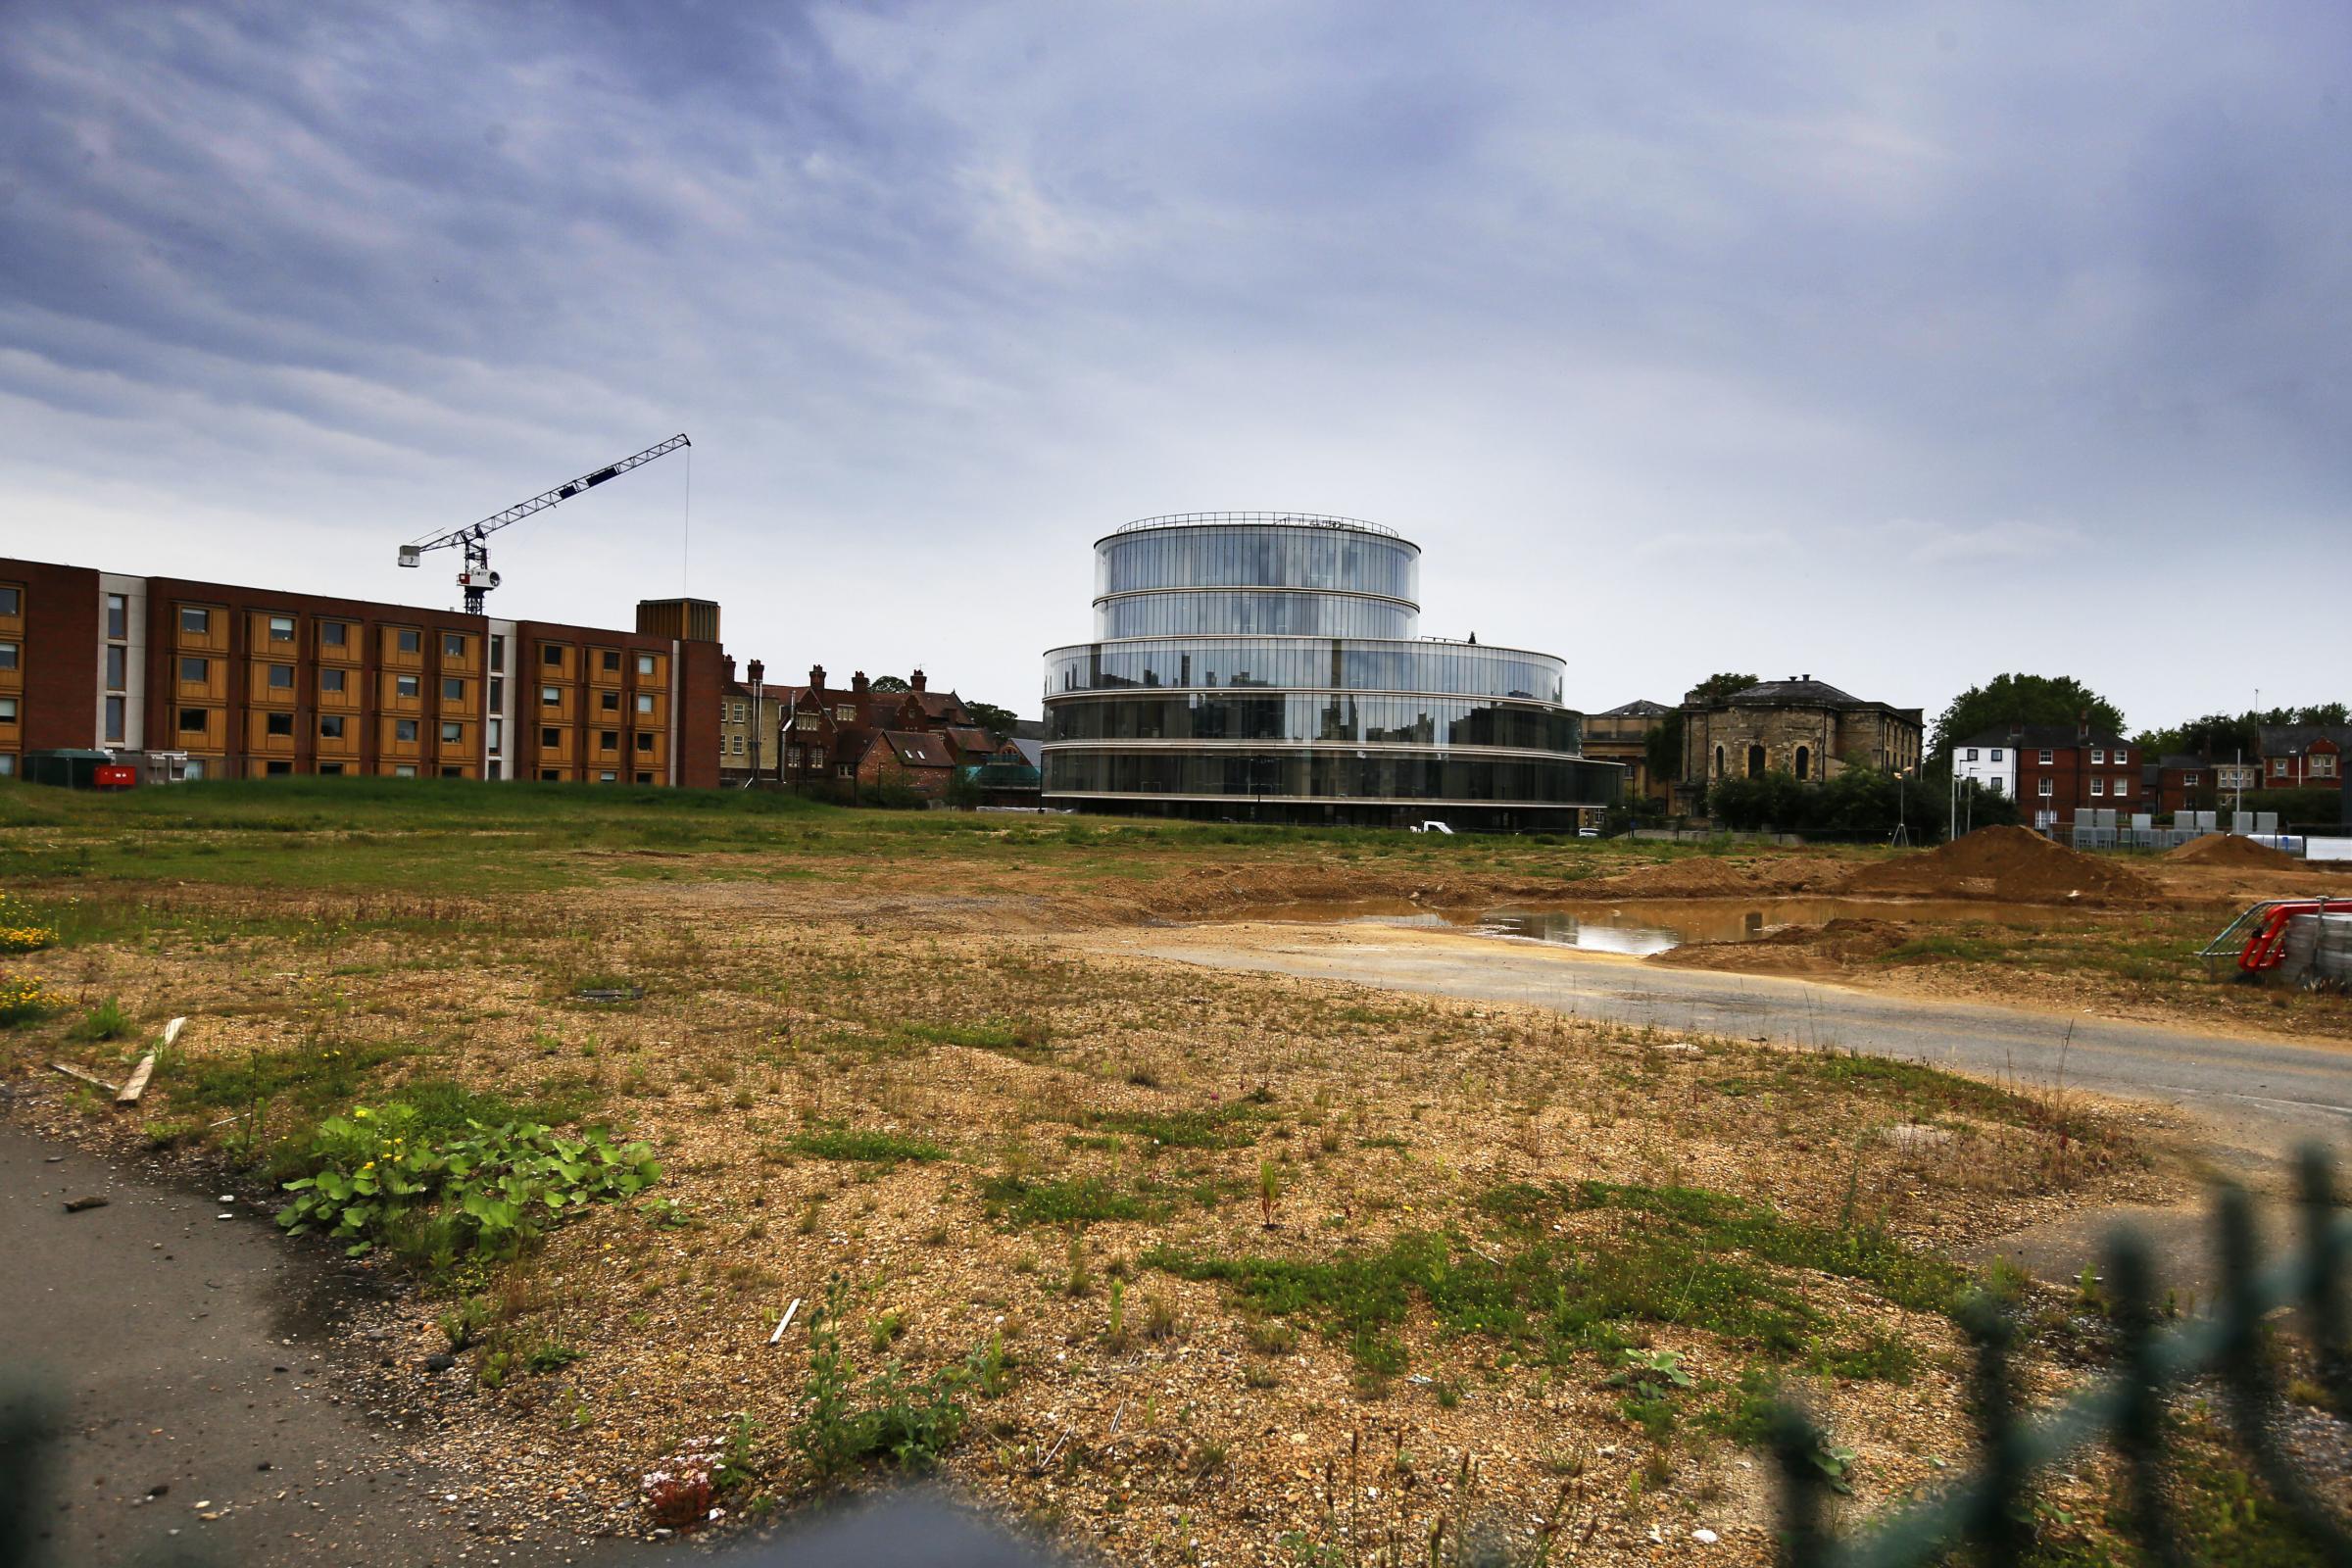 Oxford University to build £150m Schwarzman centre in Jericho